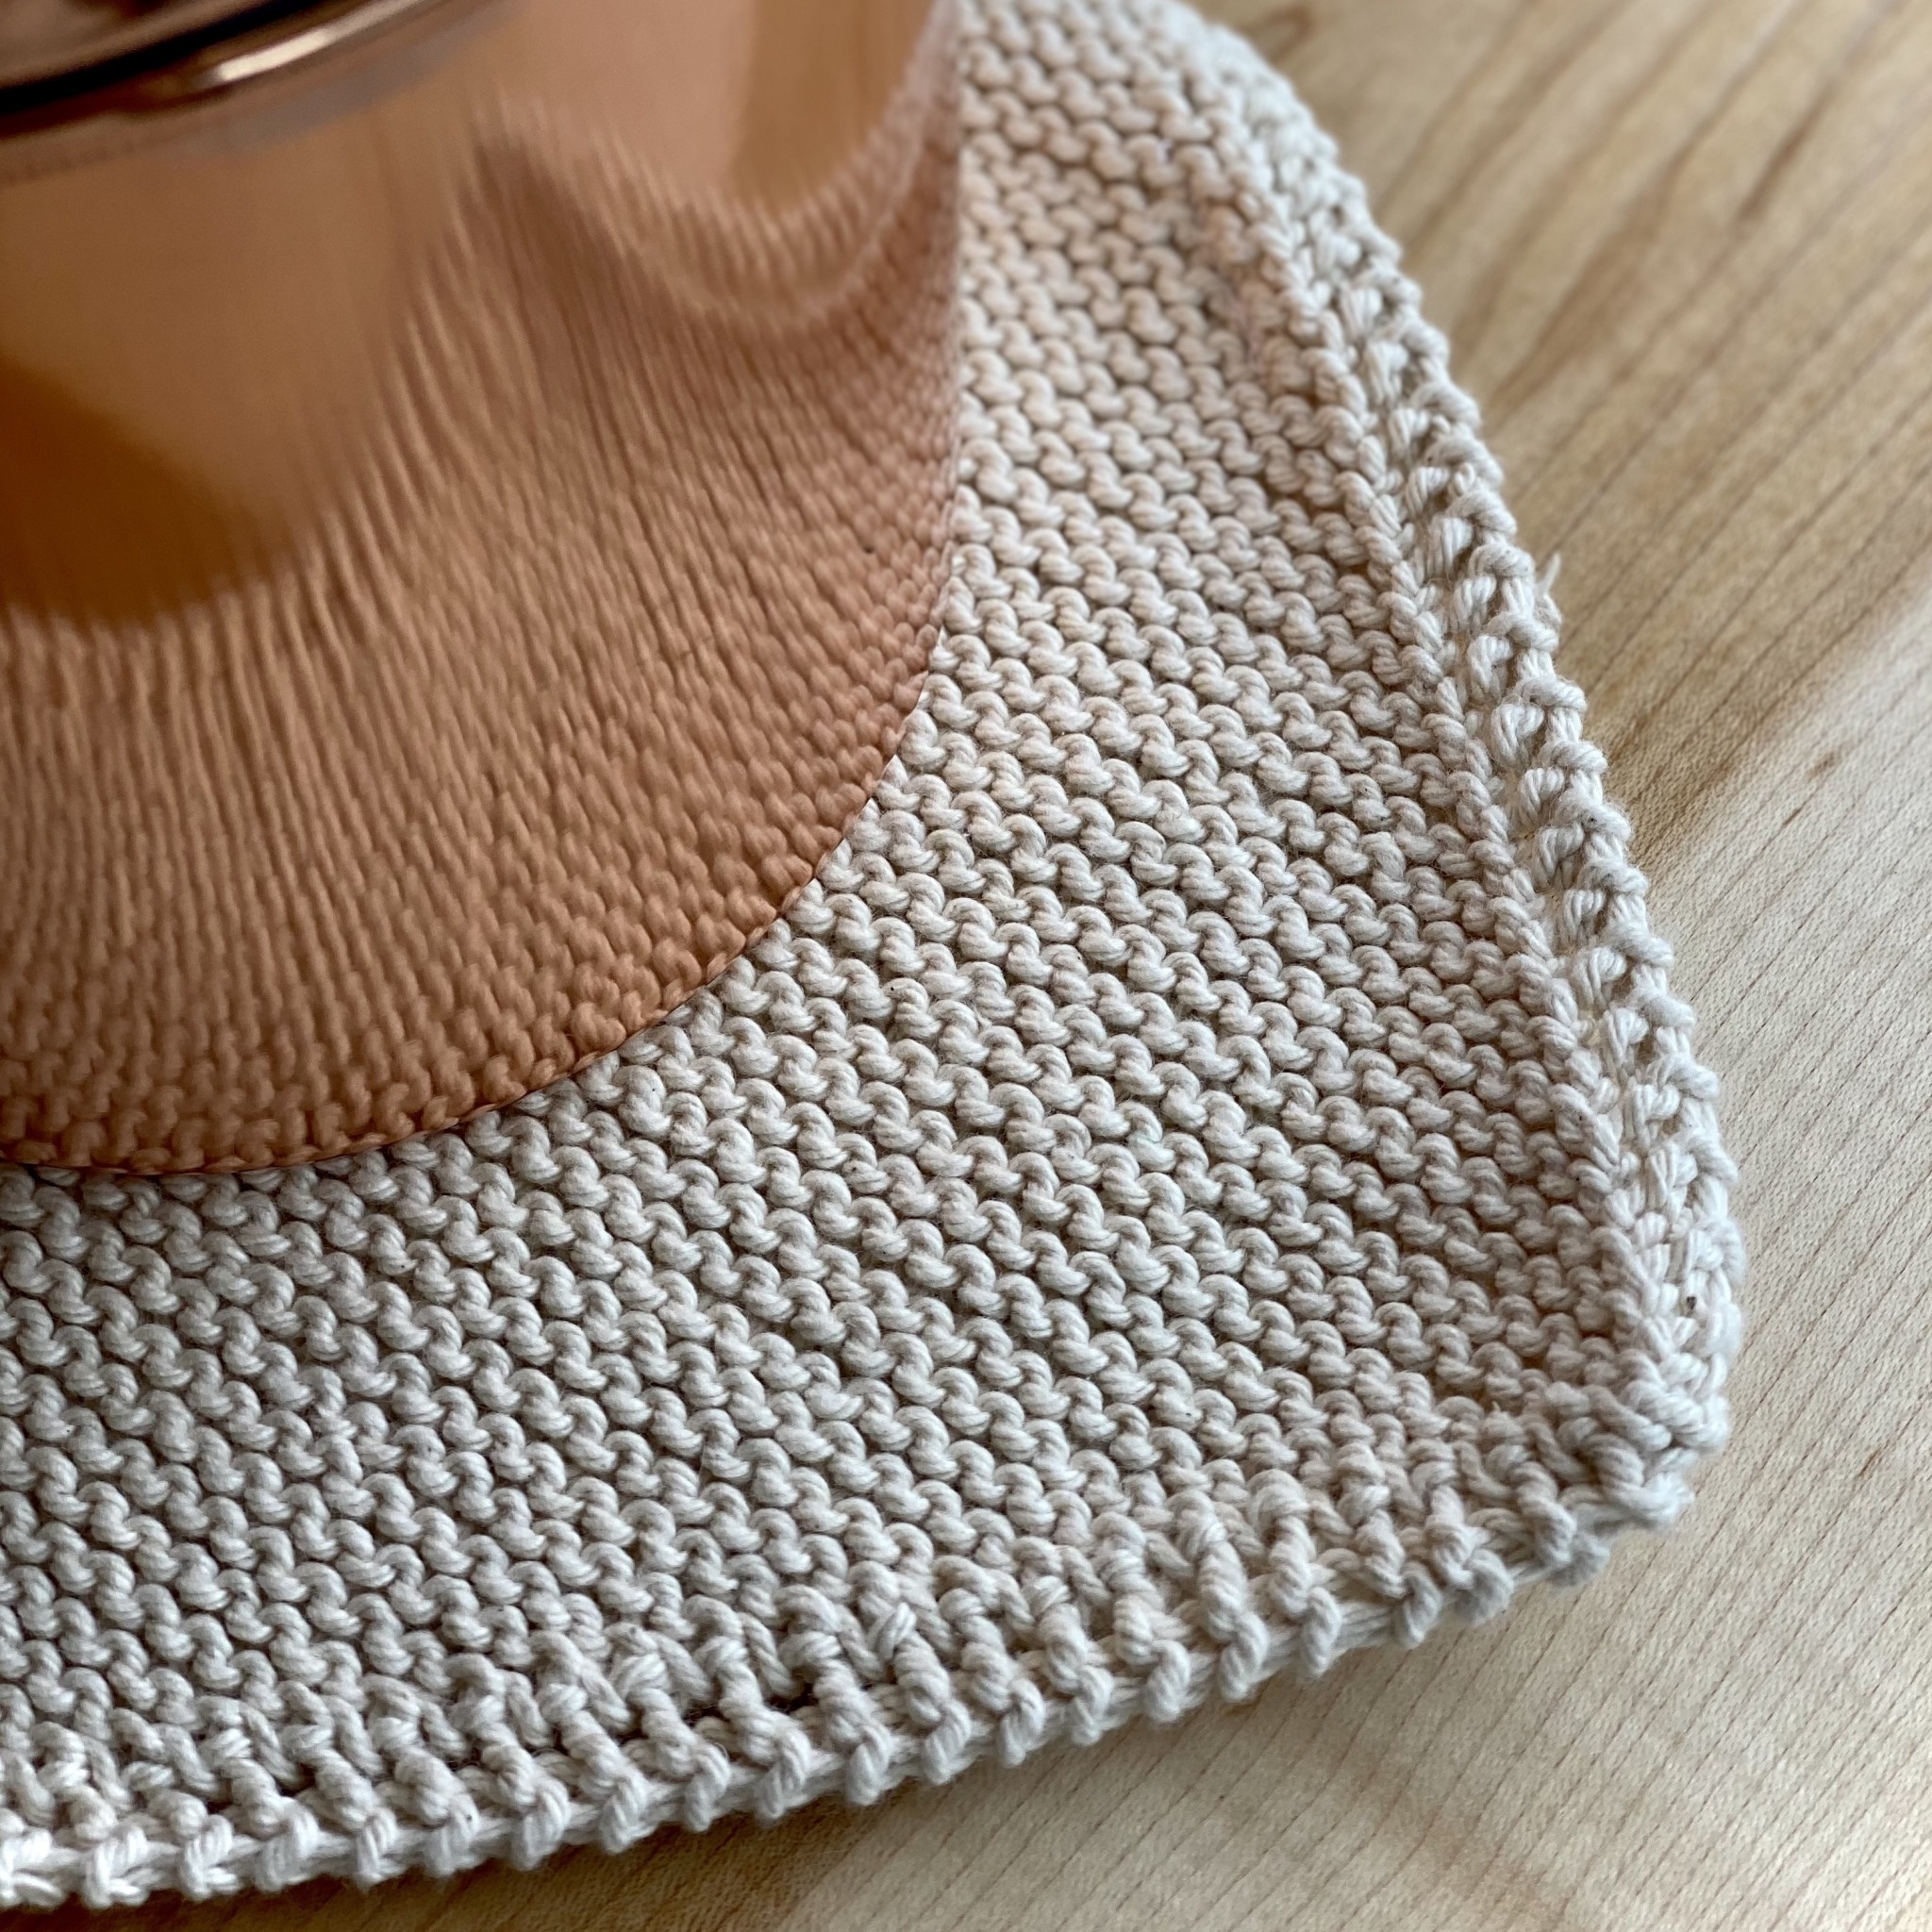 Toockies Hand Knit Organic Scrubbing Pad - Square - Individual